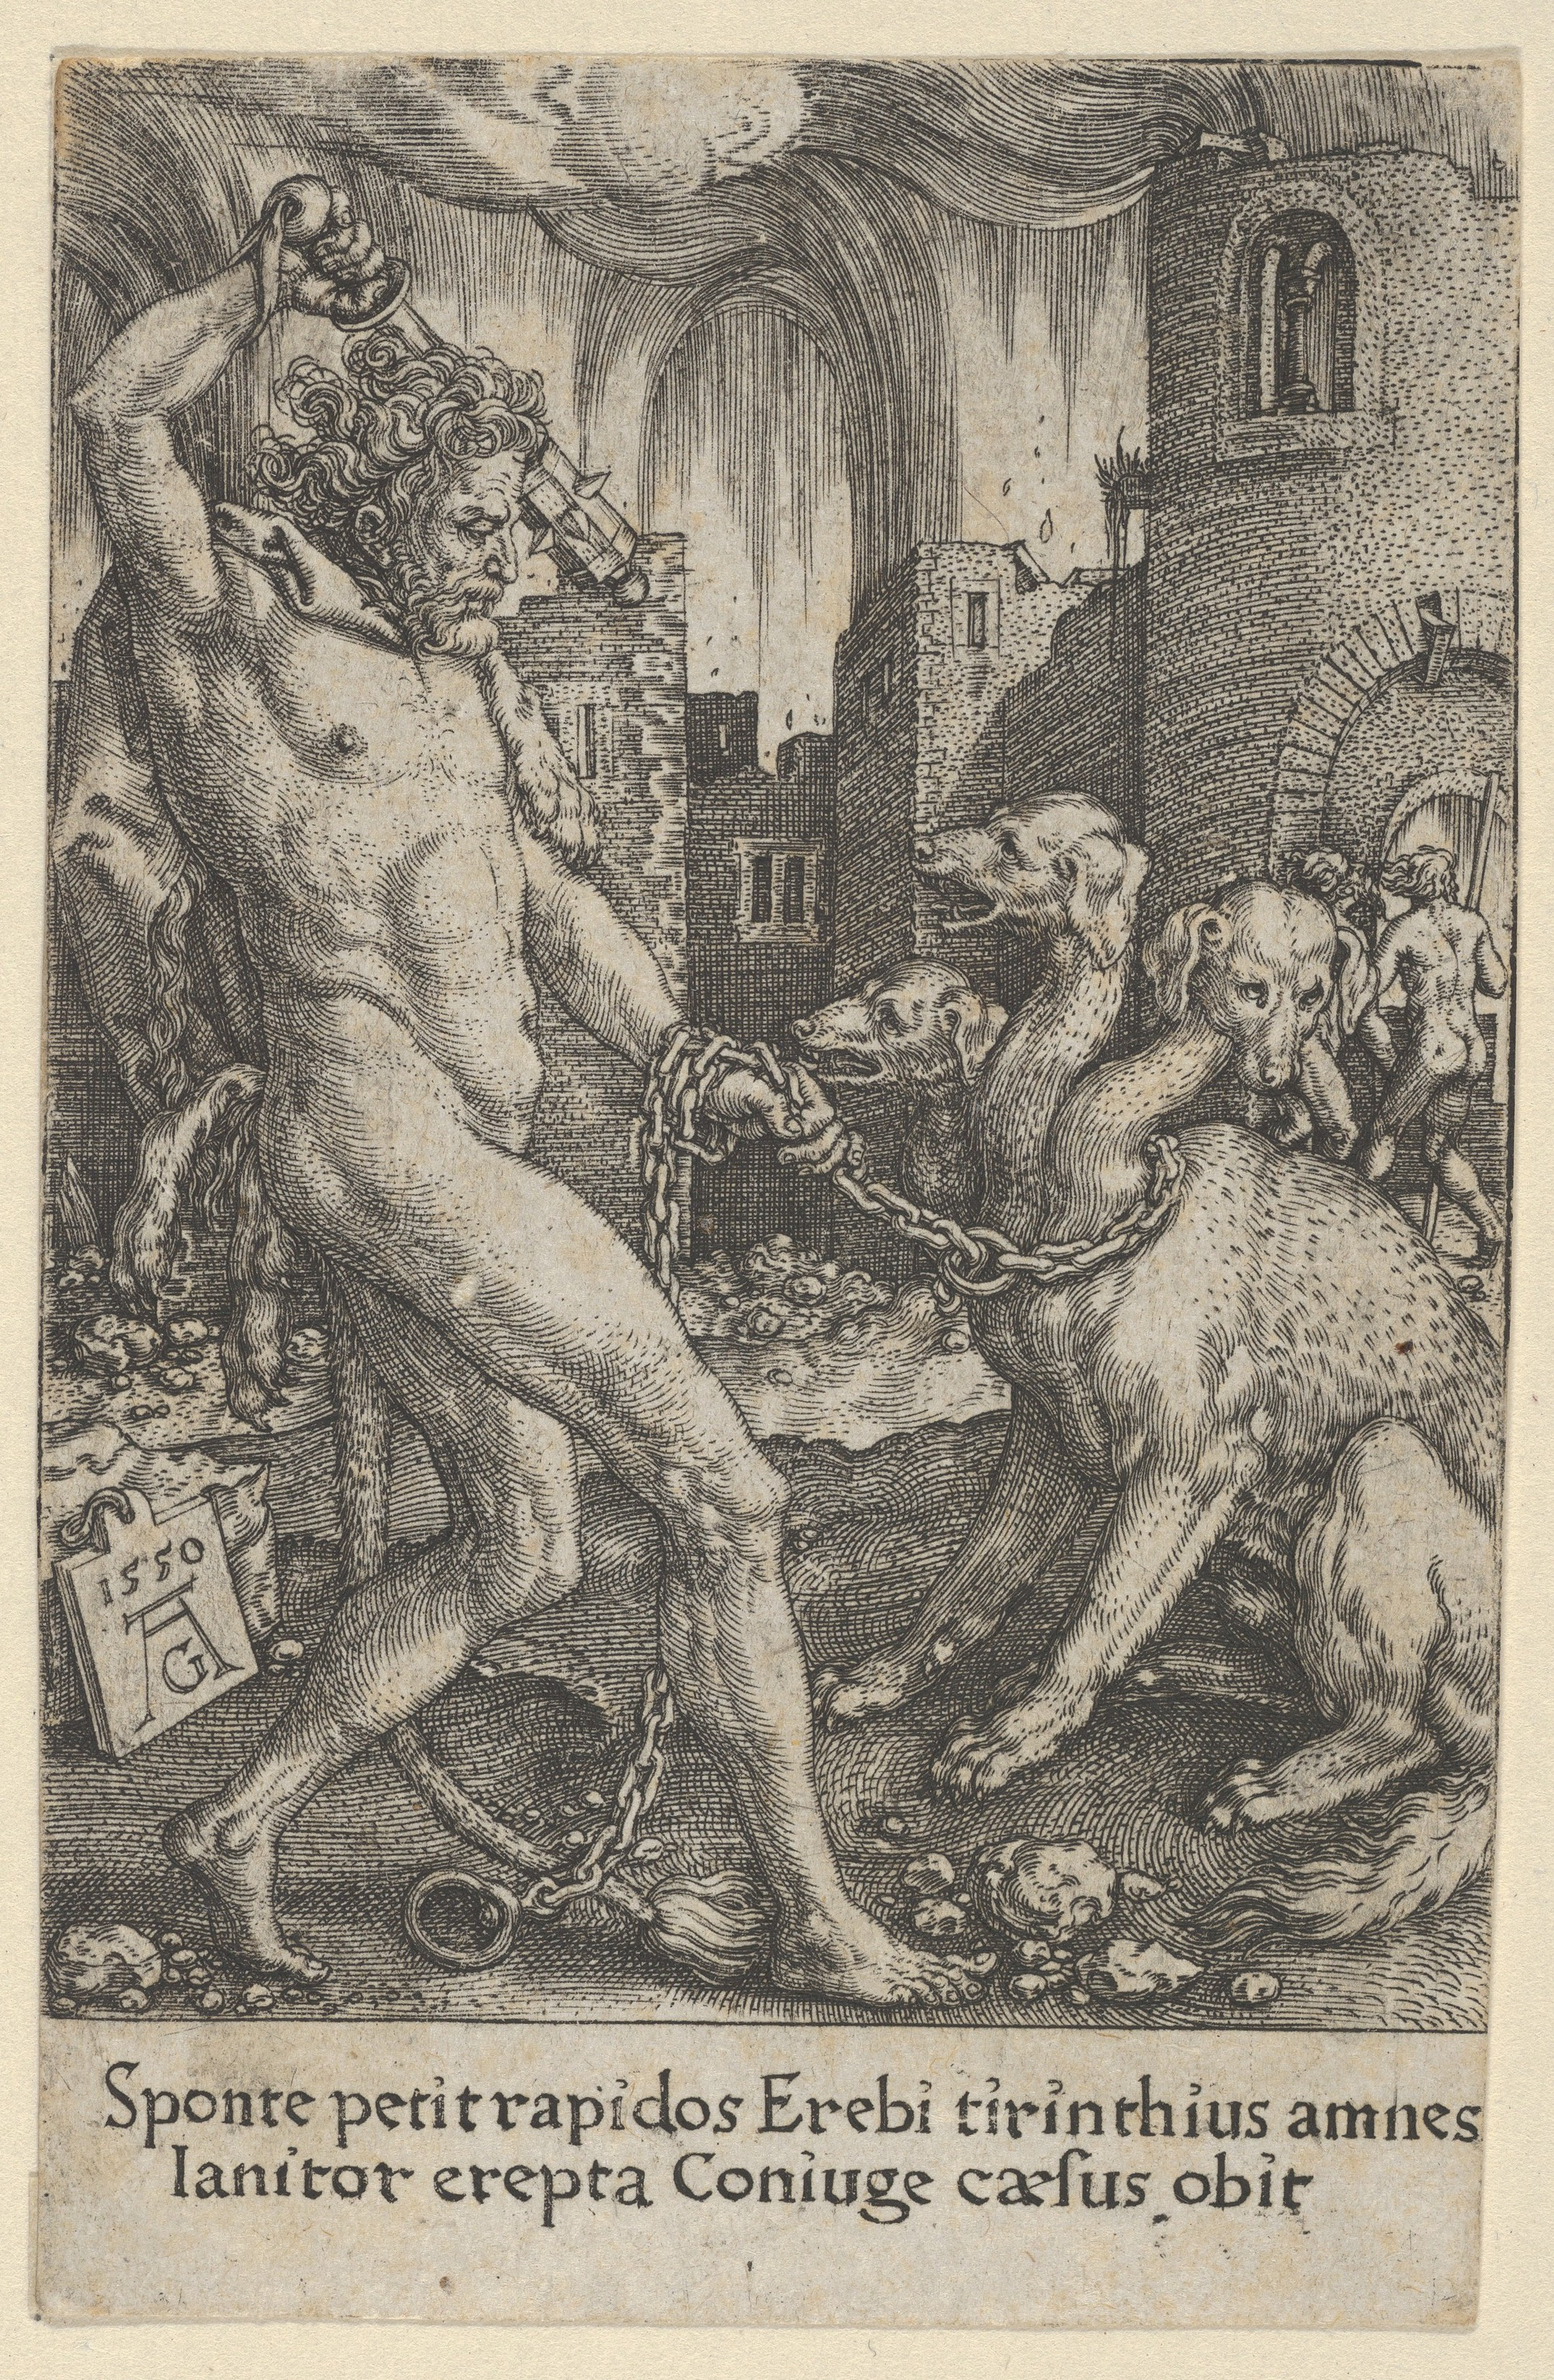 File Hercules And Cerberus From The Labors Of Hercules